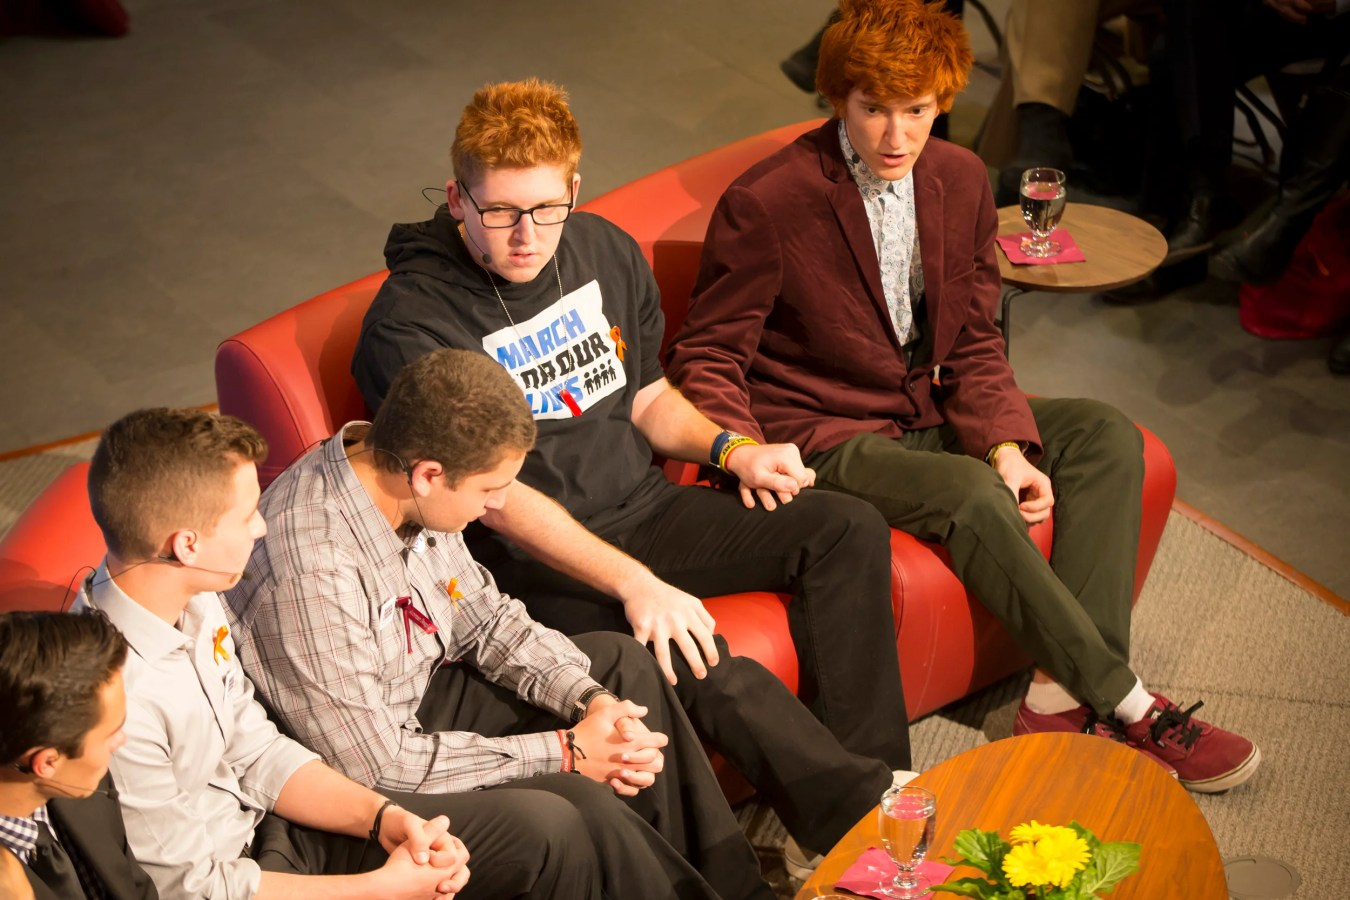 Brothers, Matt, left, and Ryan Deitsch clasp hands.